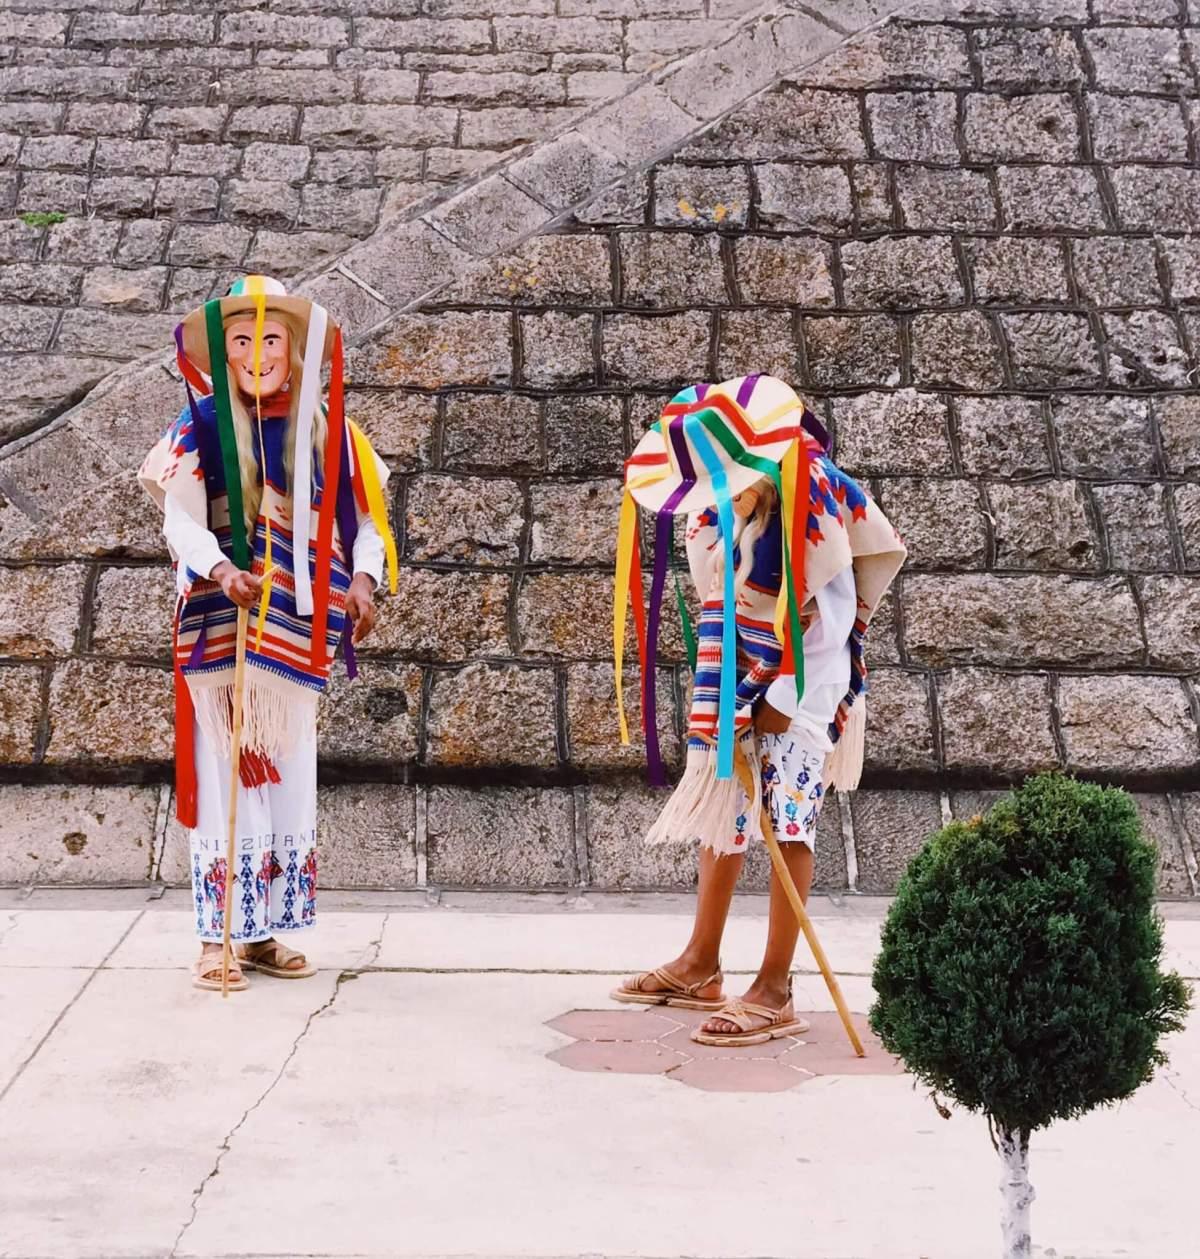 Dance of the Elderly | Janitzio, Michoacán, Mexico